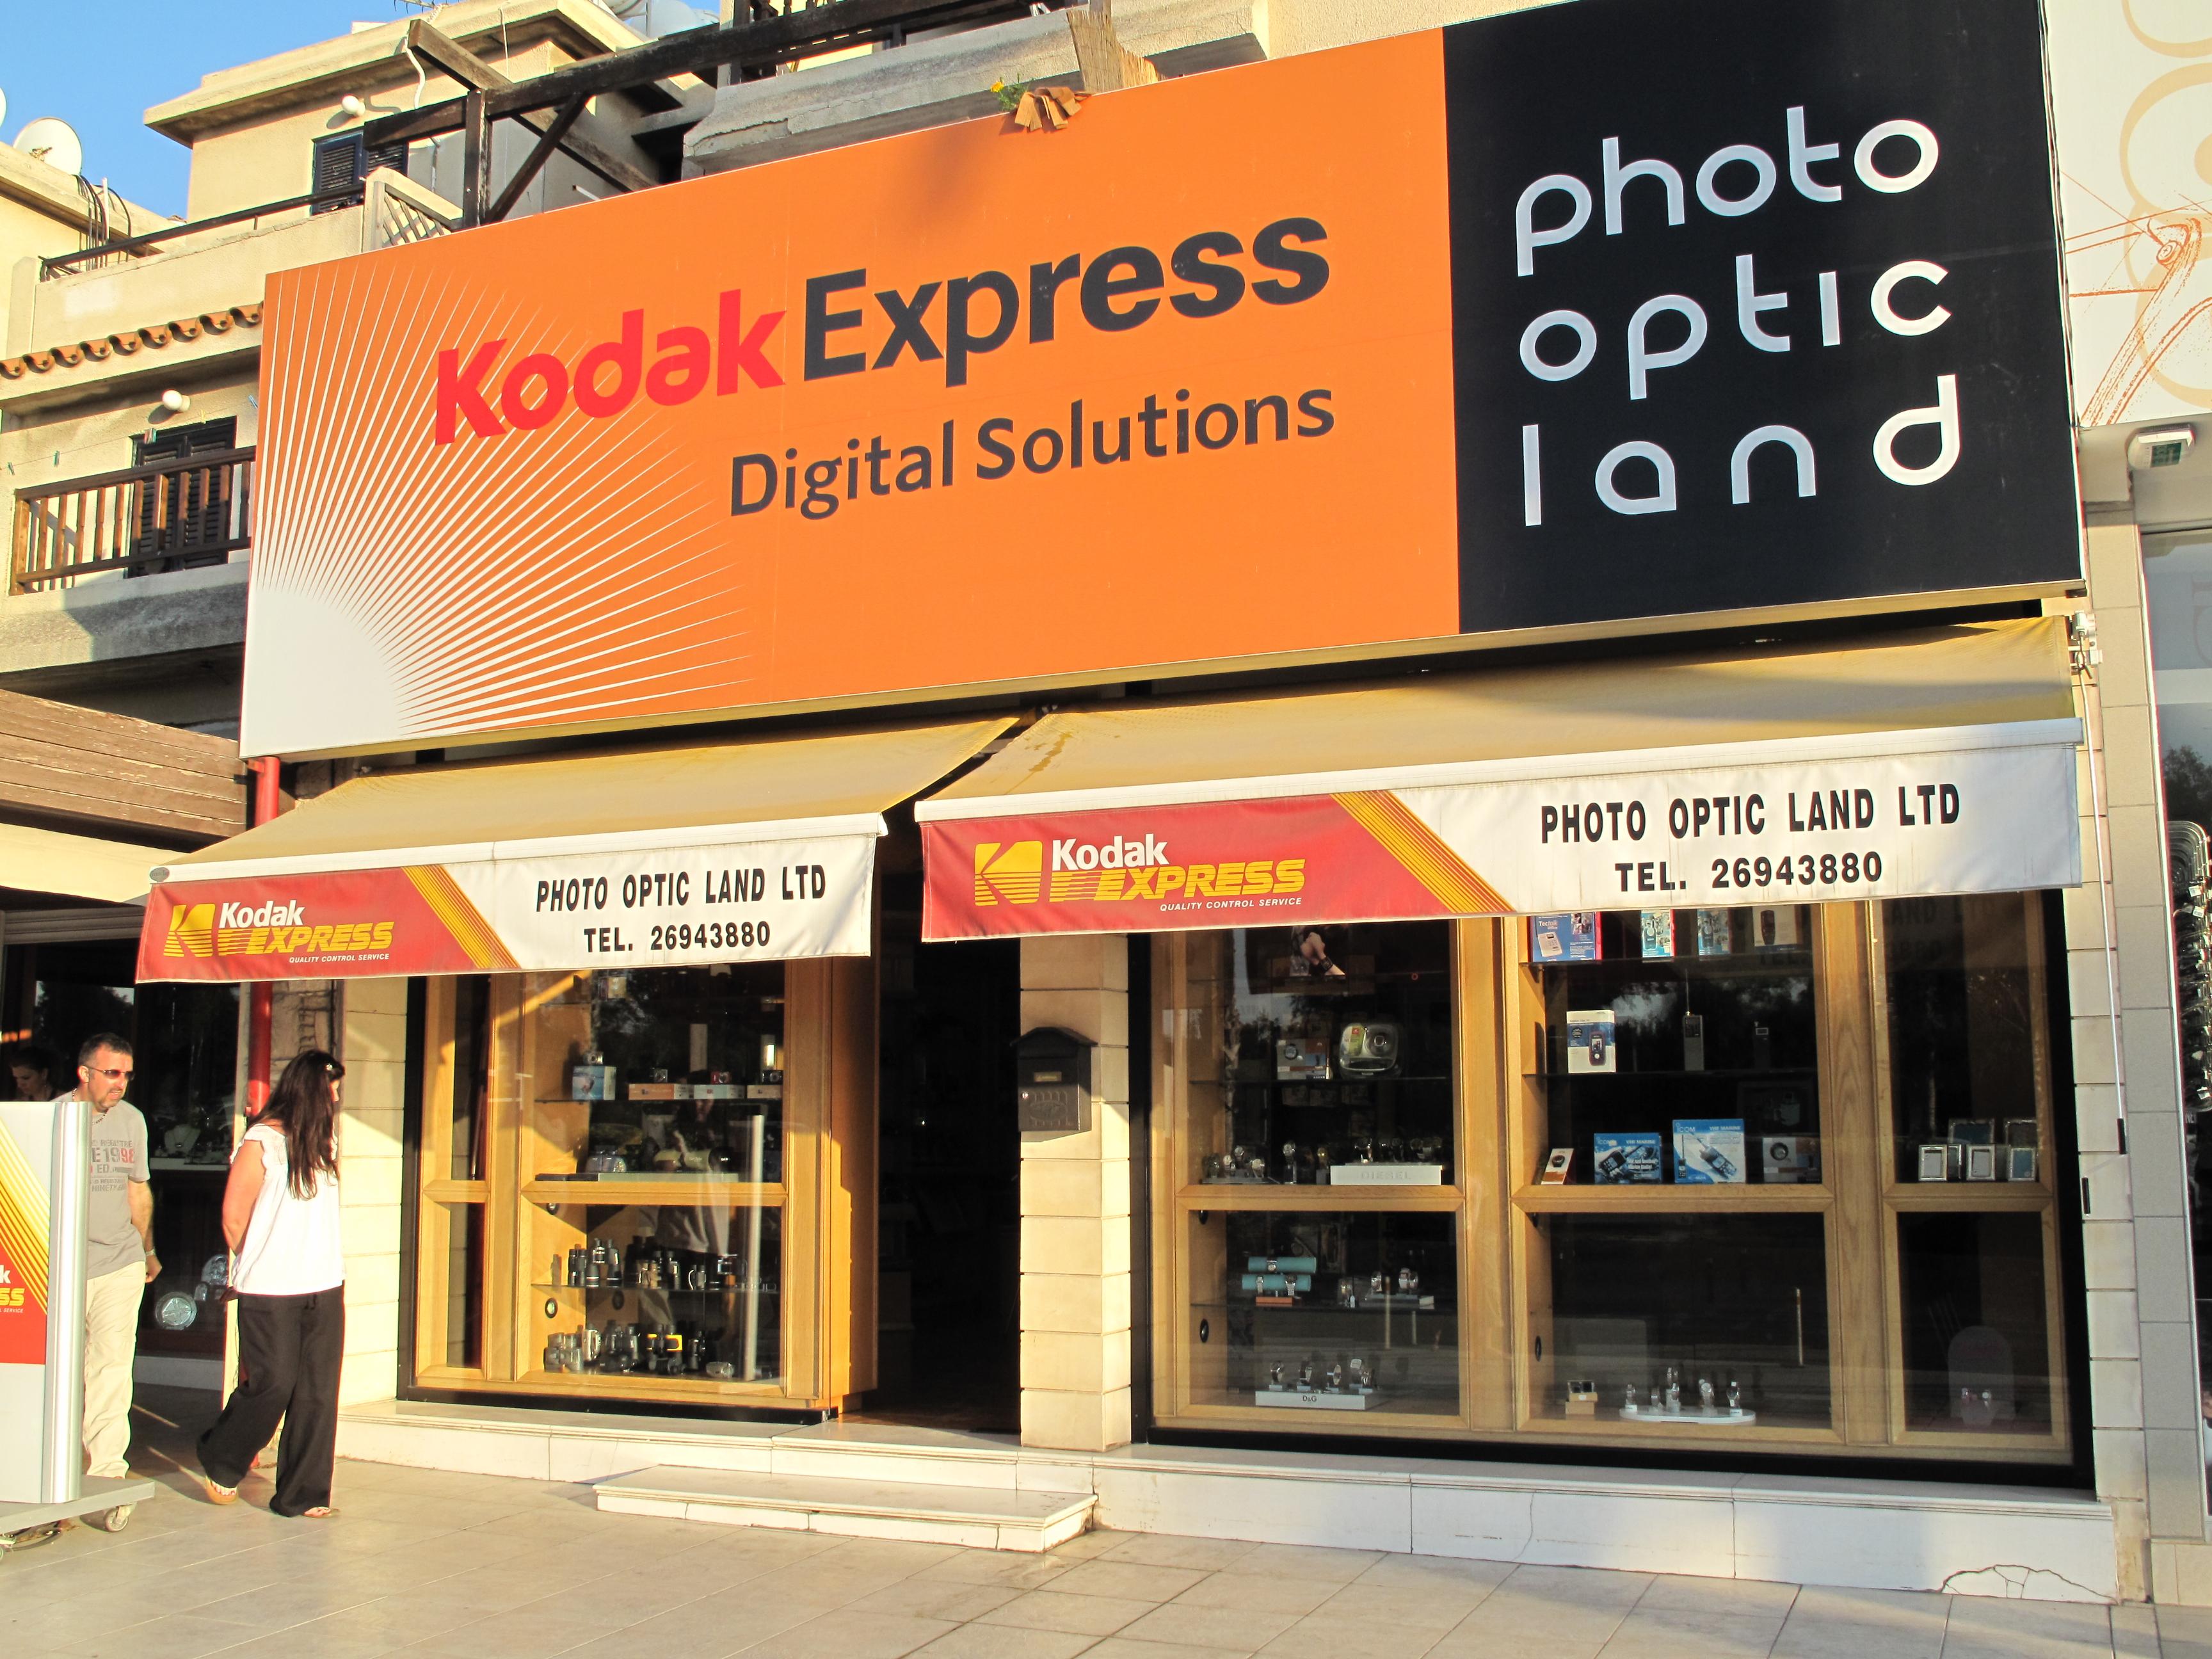 Photo Optic Land Ltd - Cyprus com